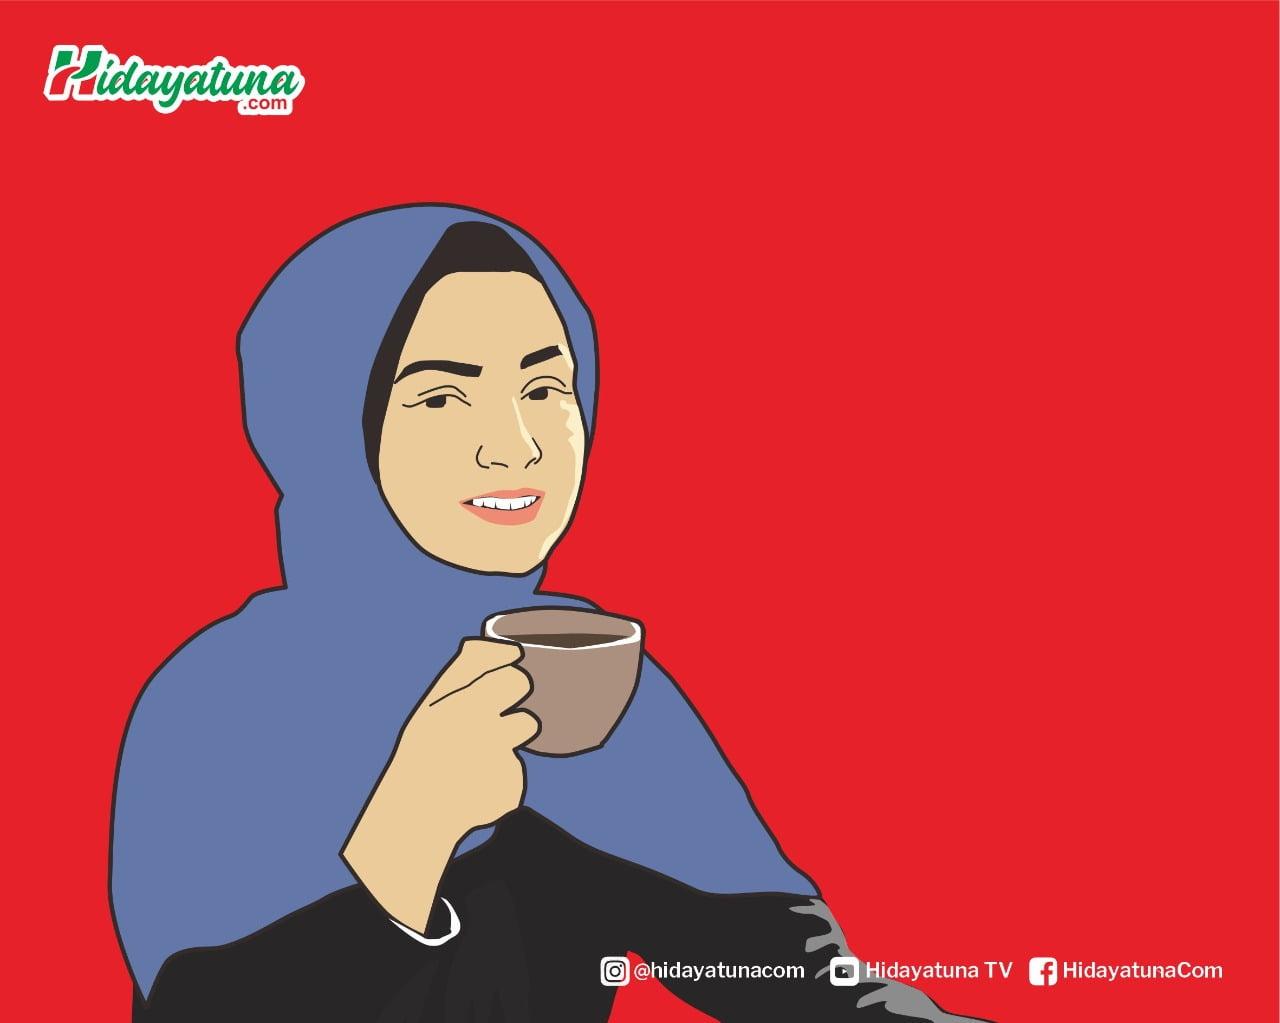 Niat Minum Kopi (Ilustrasi/Hidayatuna)